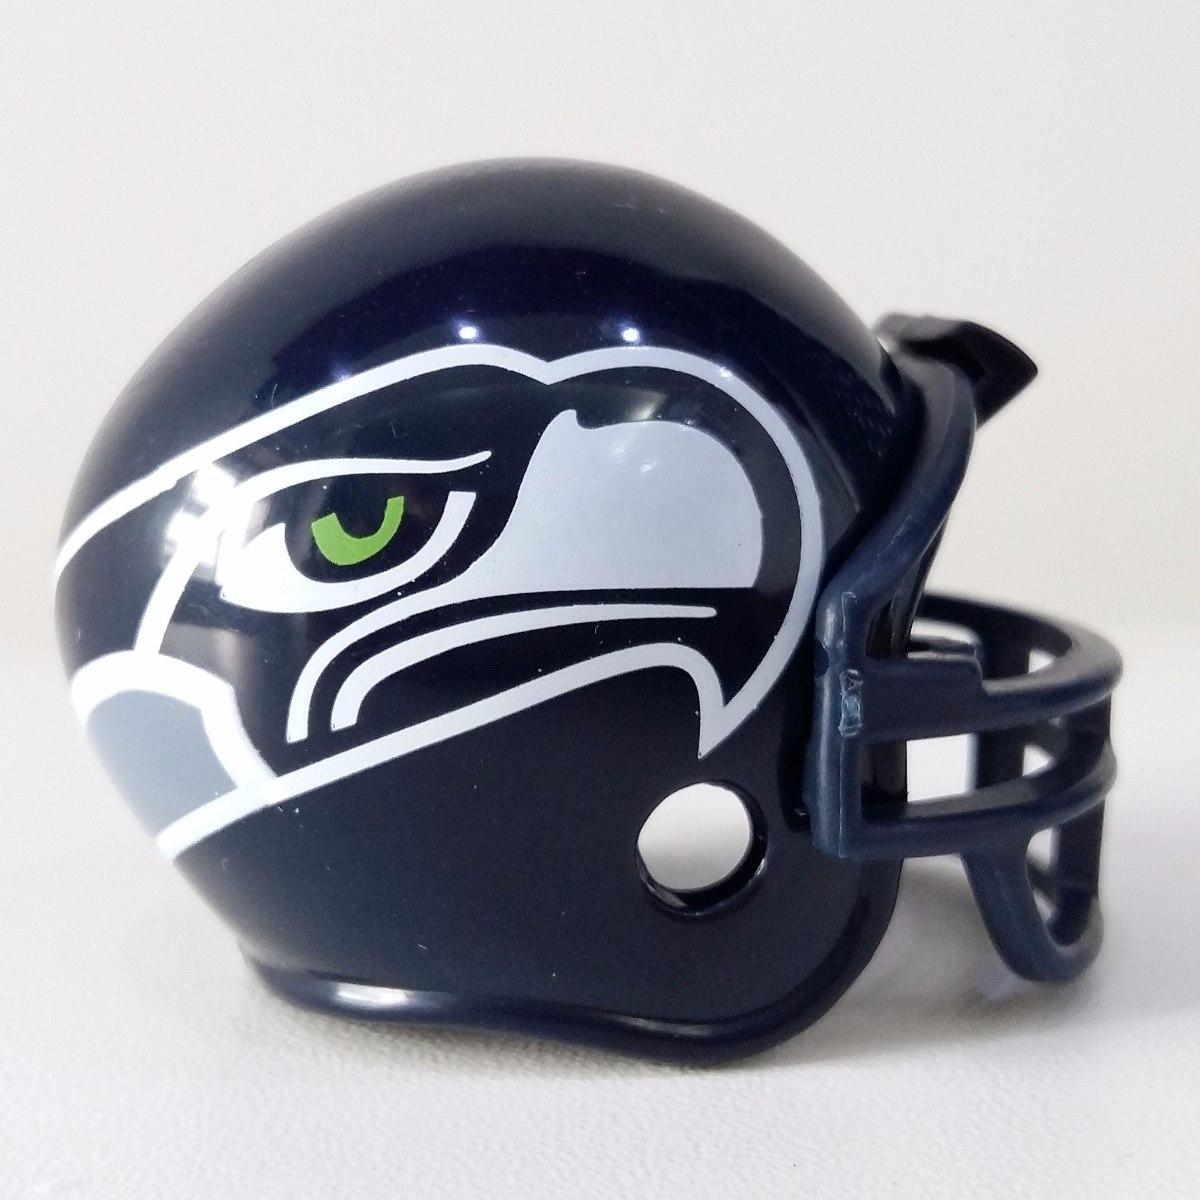 Mini Capacete Futebol Americano Nfl - Seattle Seahawks 5cm - R  24 ... 80fc9addd073c